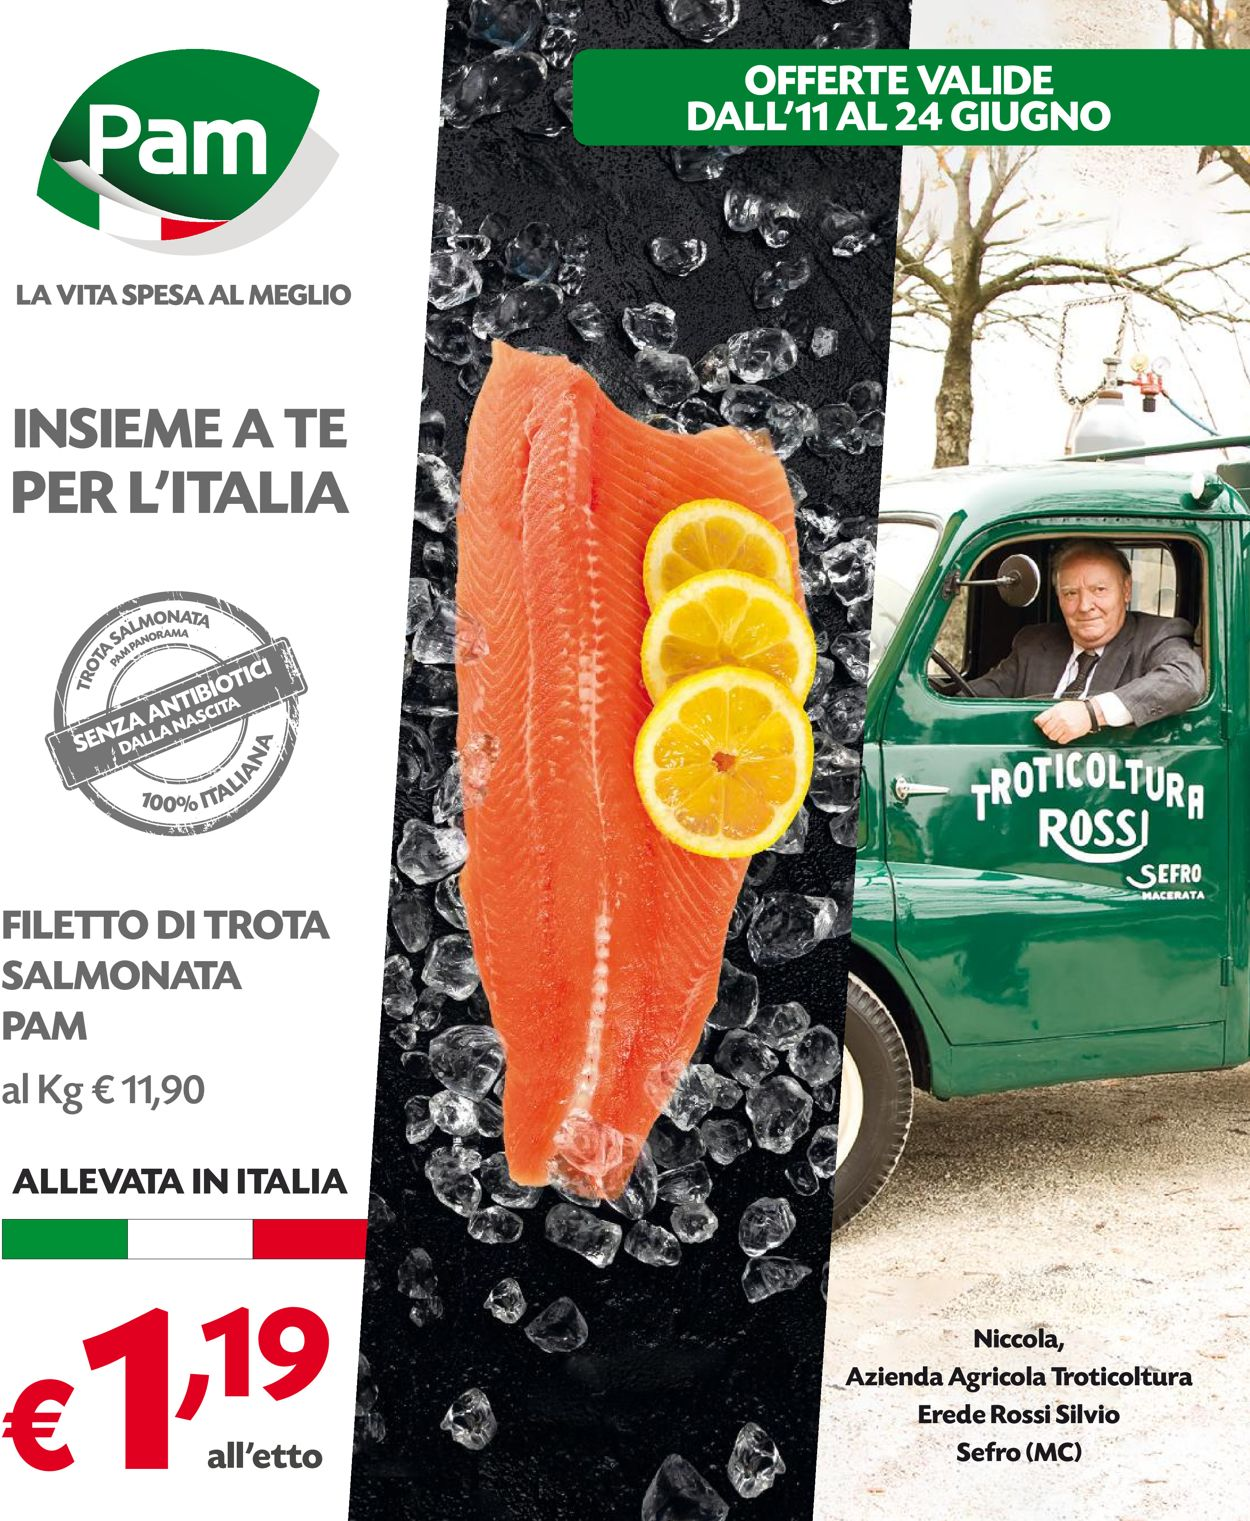 Volantino Pam Panorama - Offerte 11/06-24/06/2020